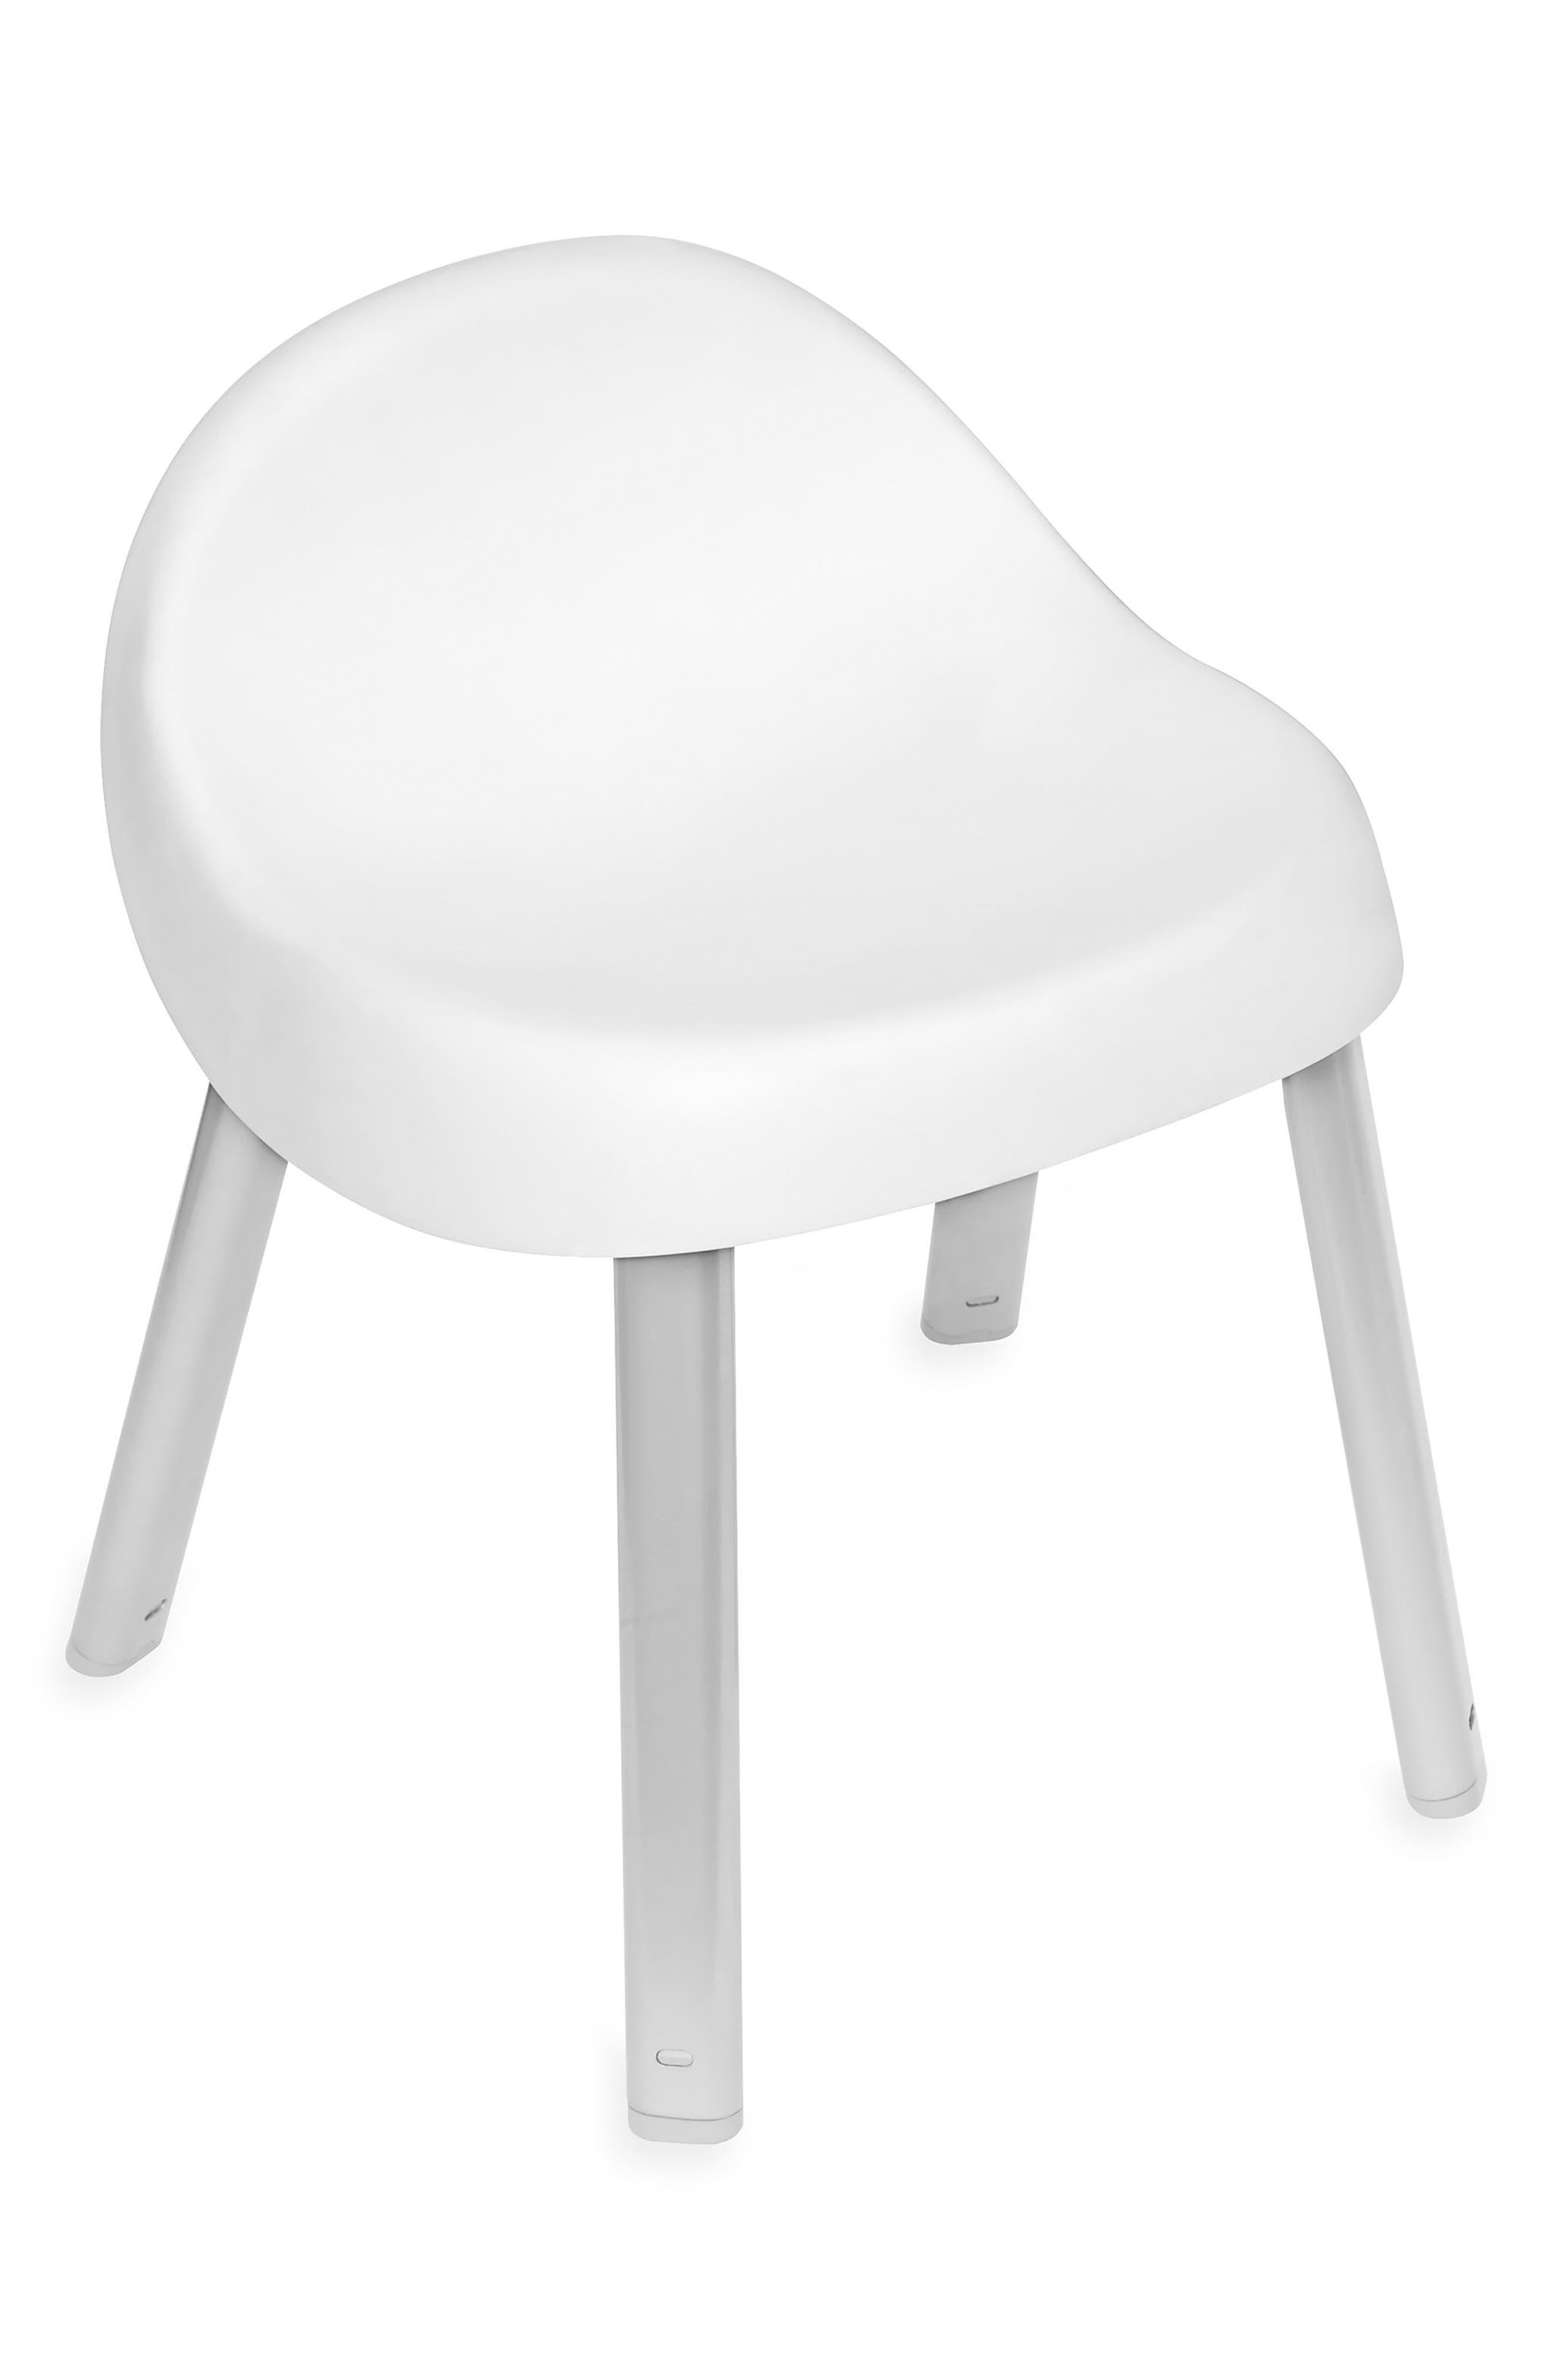 Explore & More Kids' Chairs,                             Alternate thumbnail 2, color,                             WHITE